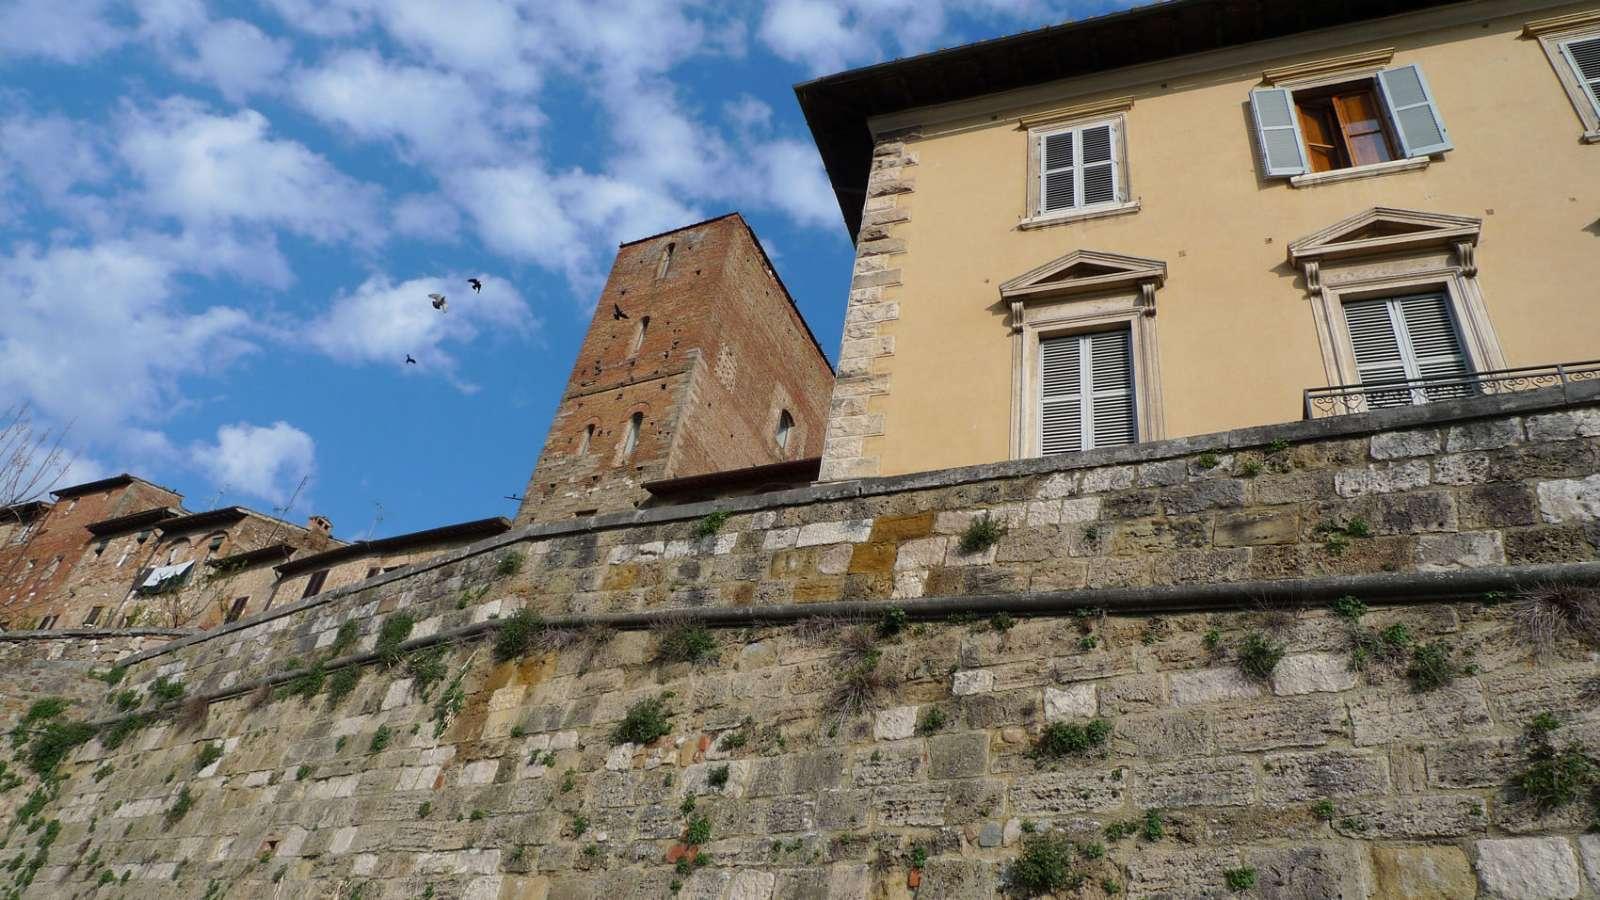 Torre di Arnolfo aus dem 12. Jahrhundert